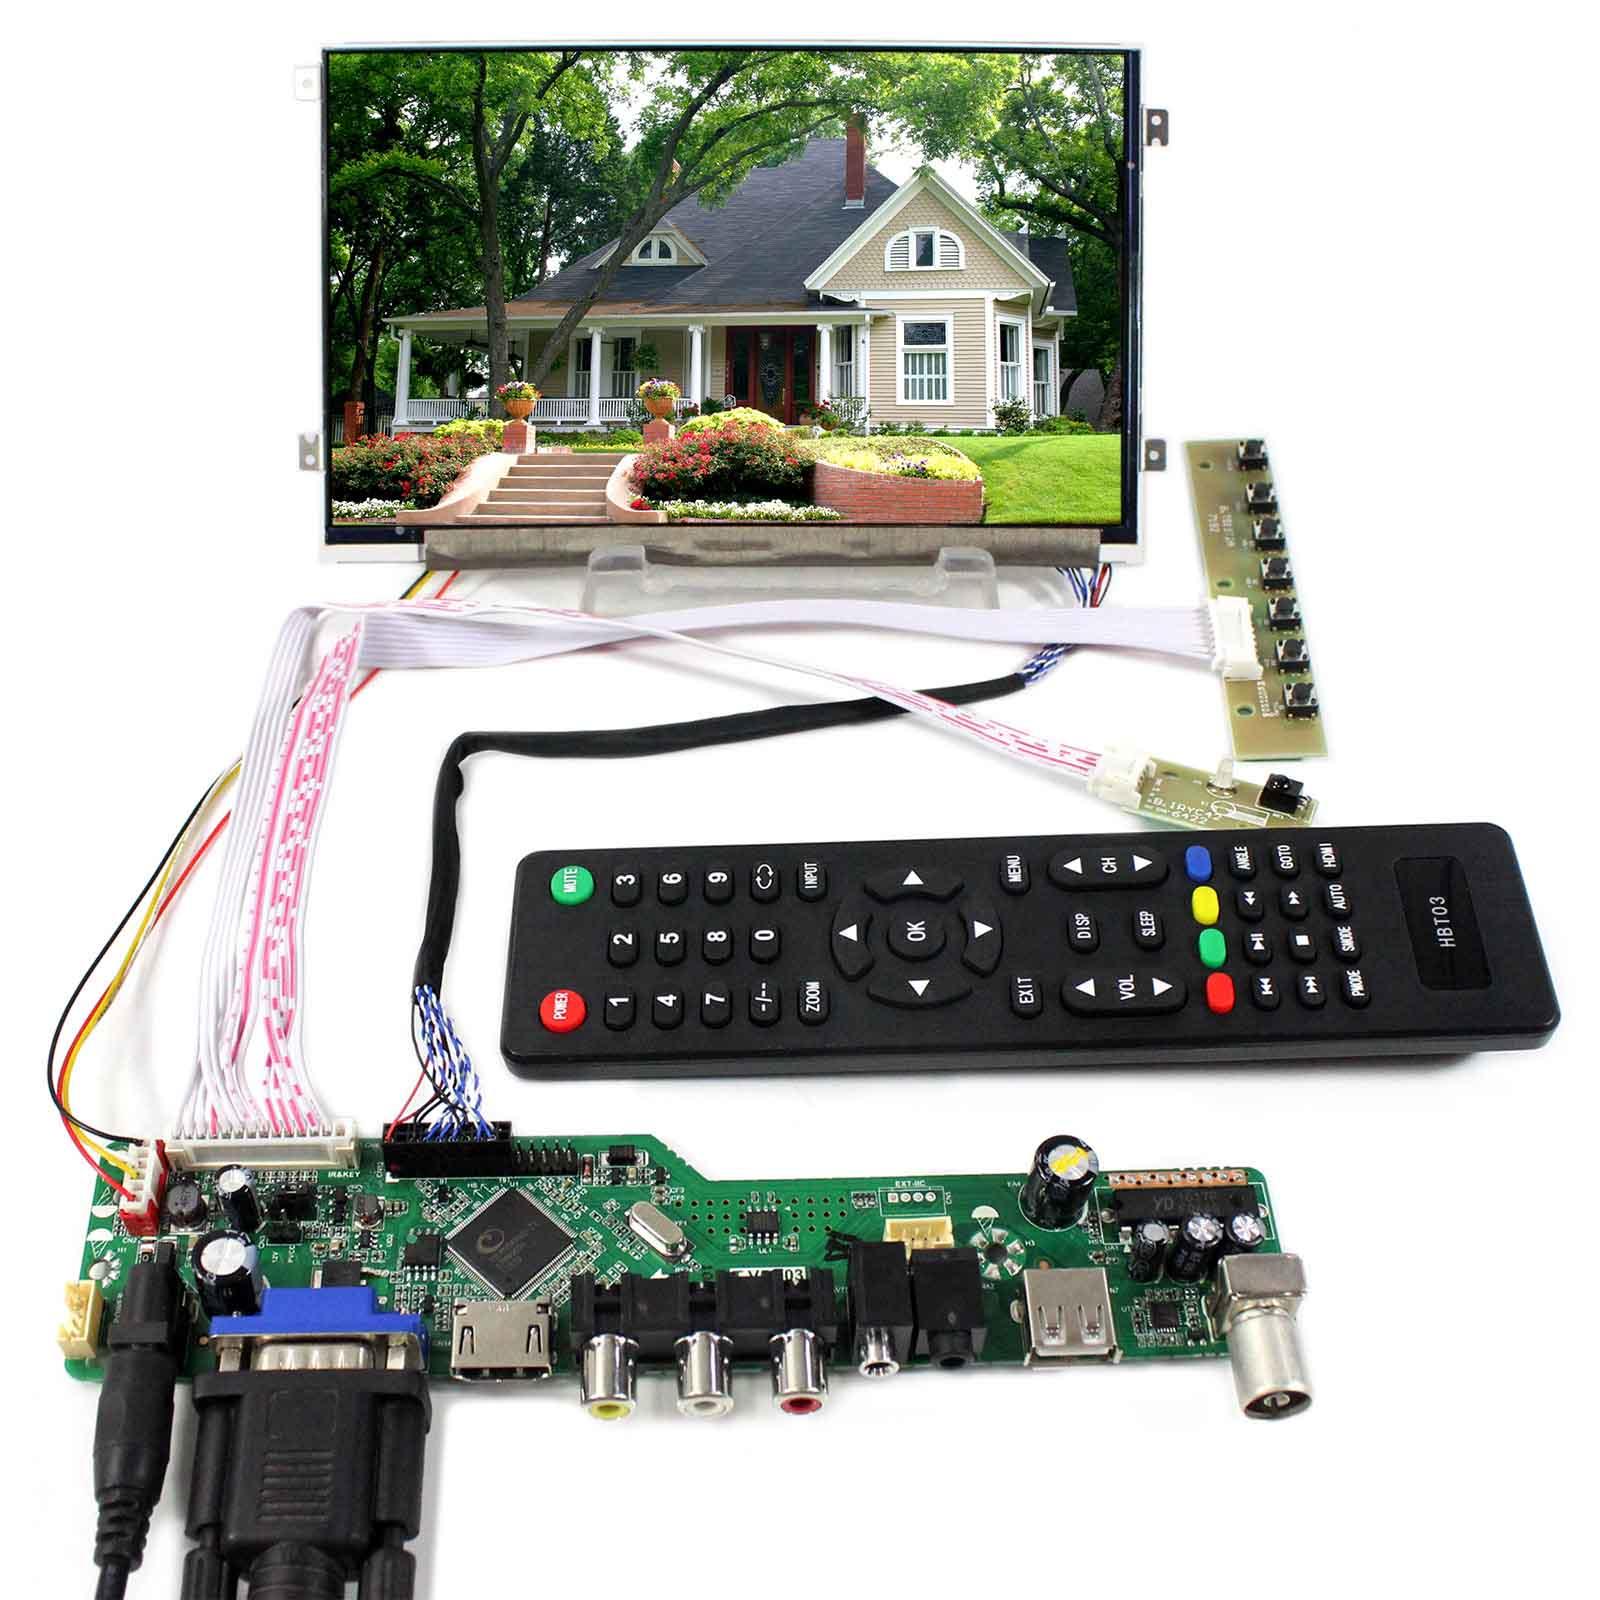 HDMI VGA AV USB RF LCD Controller Board With 7inch 1024x600 HV070WS1 105 LCD Screen